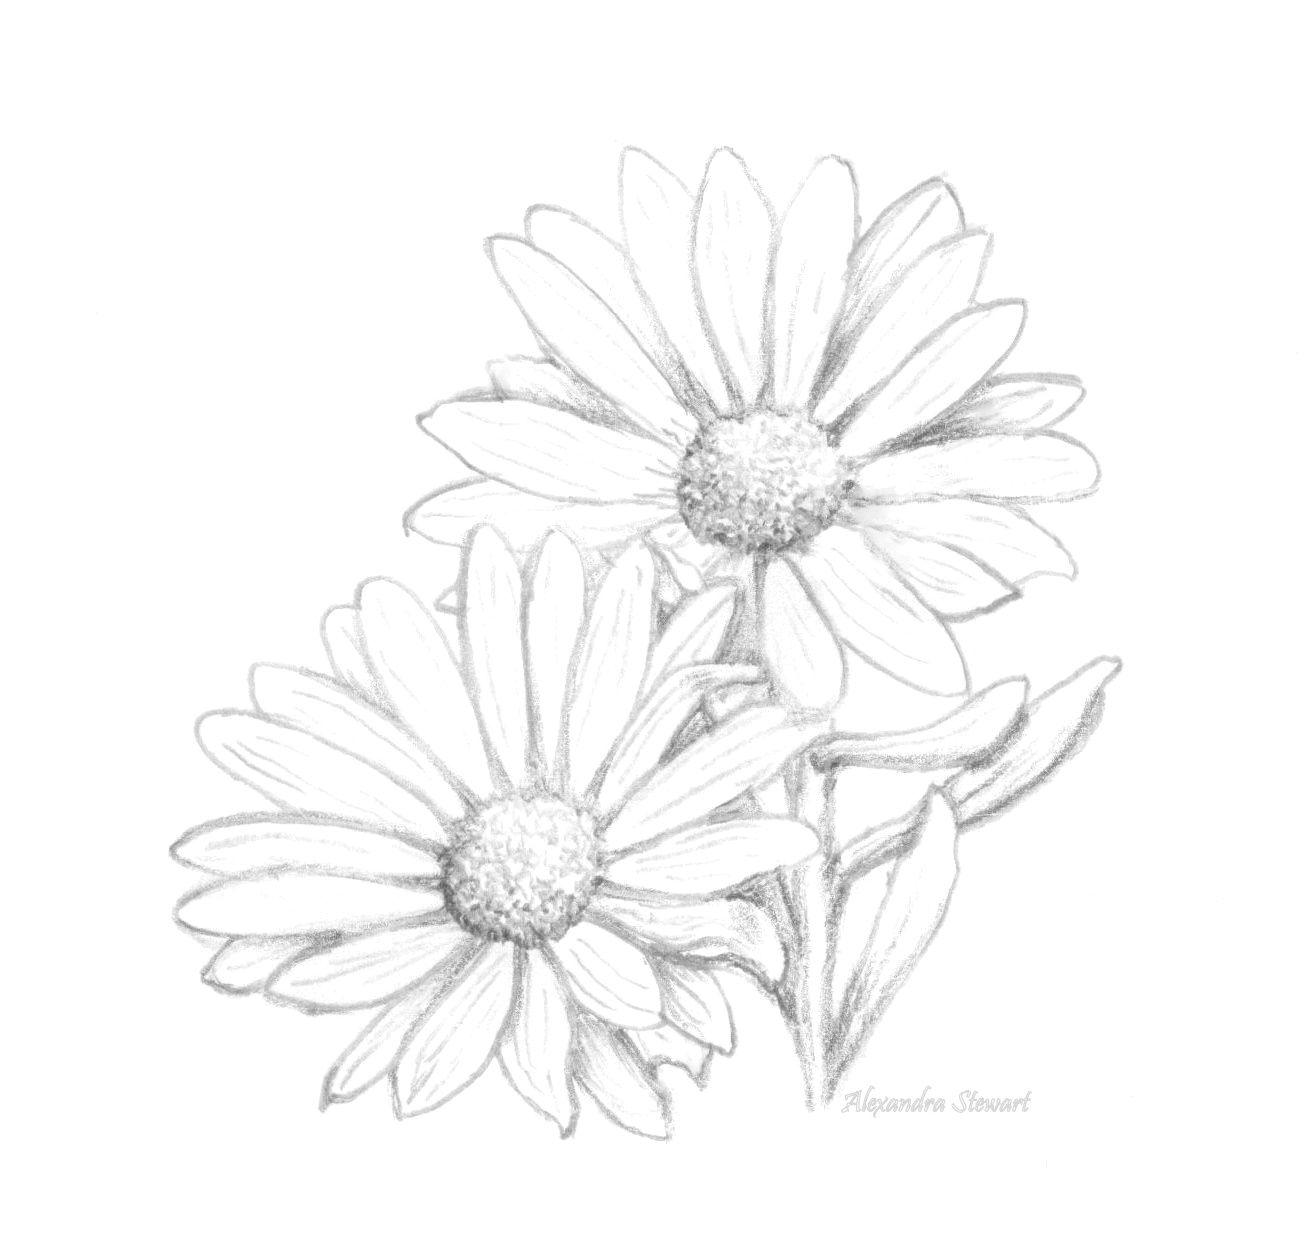 Bellissimo tattoos daisy flower drawing daisy drawing flower